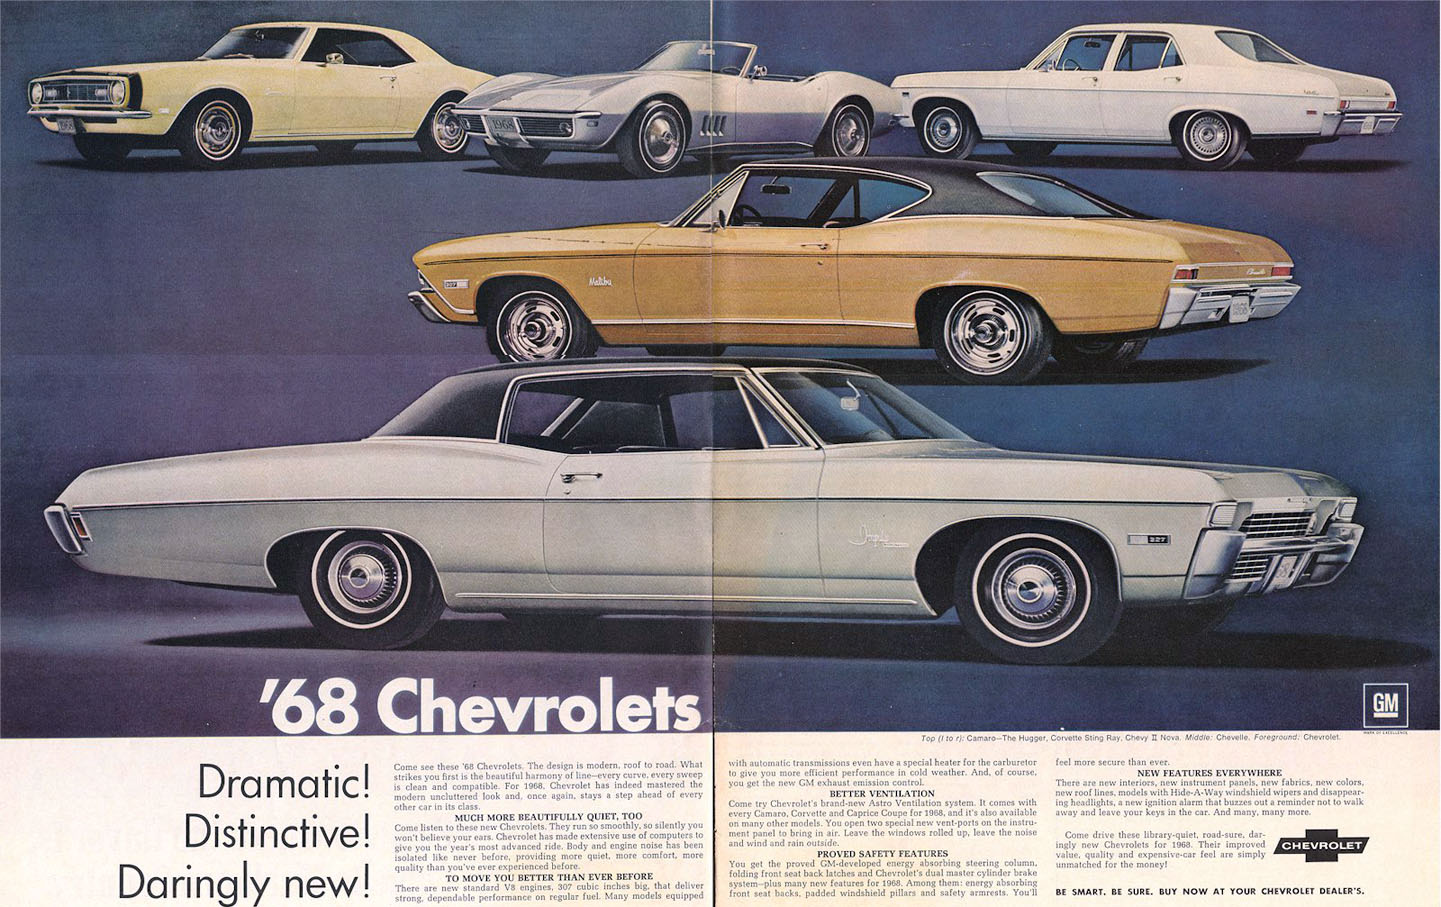 1968 Chevrolet Ad 01